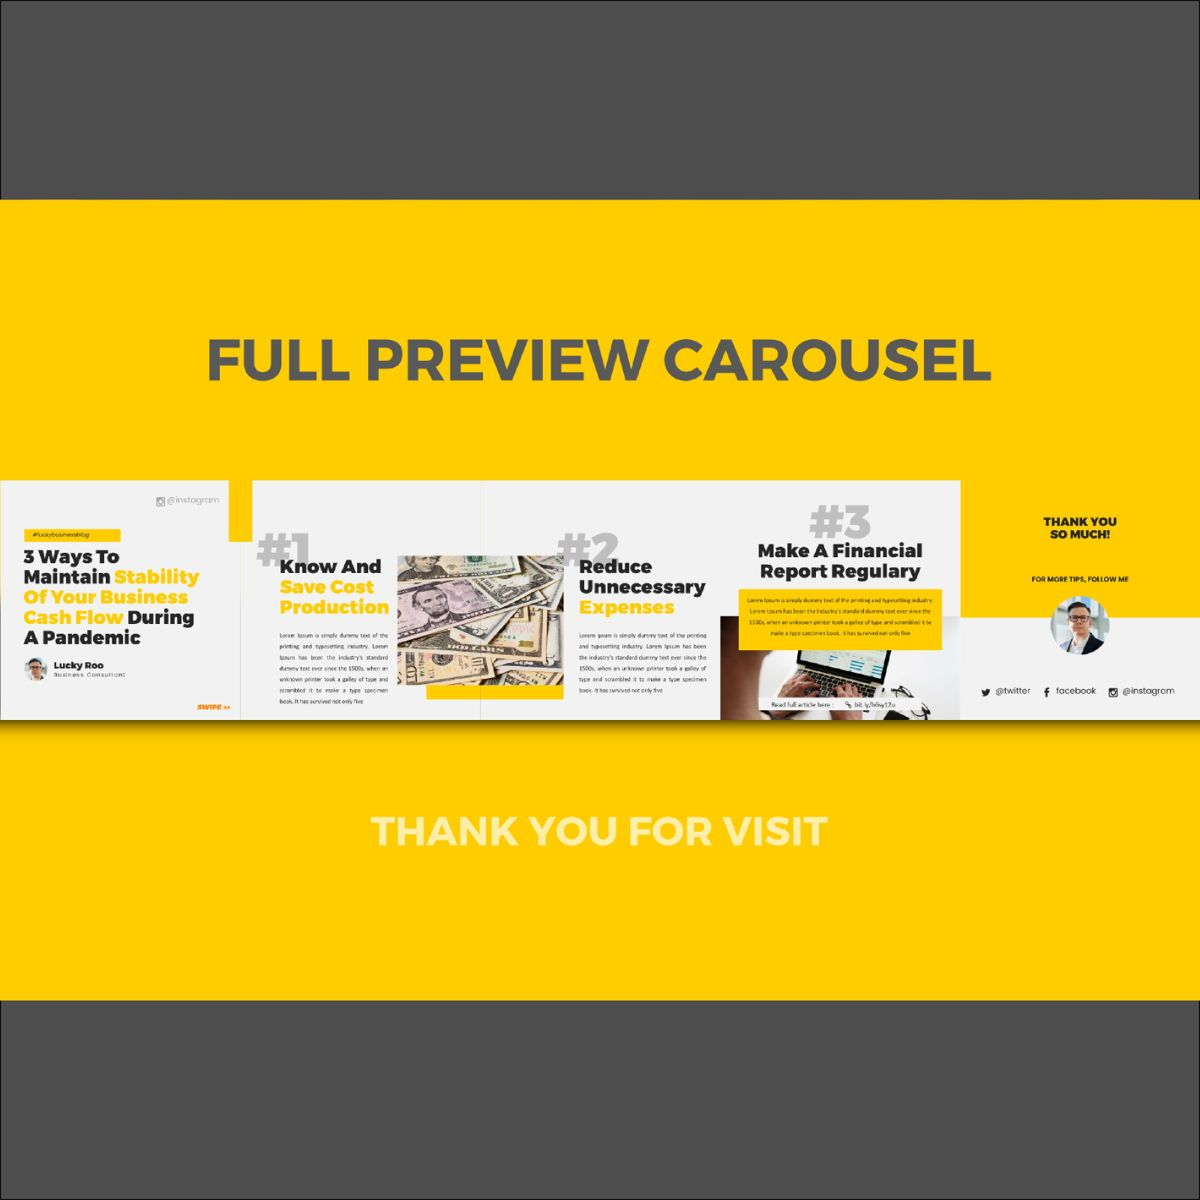 Money management during pandemic tips instagram carousel powerpoint template, Slide 3, 07119, Business Models — PoweredTemplate.com